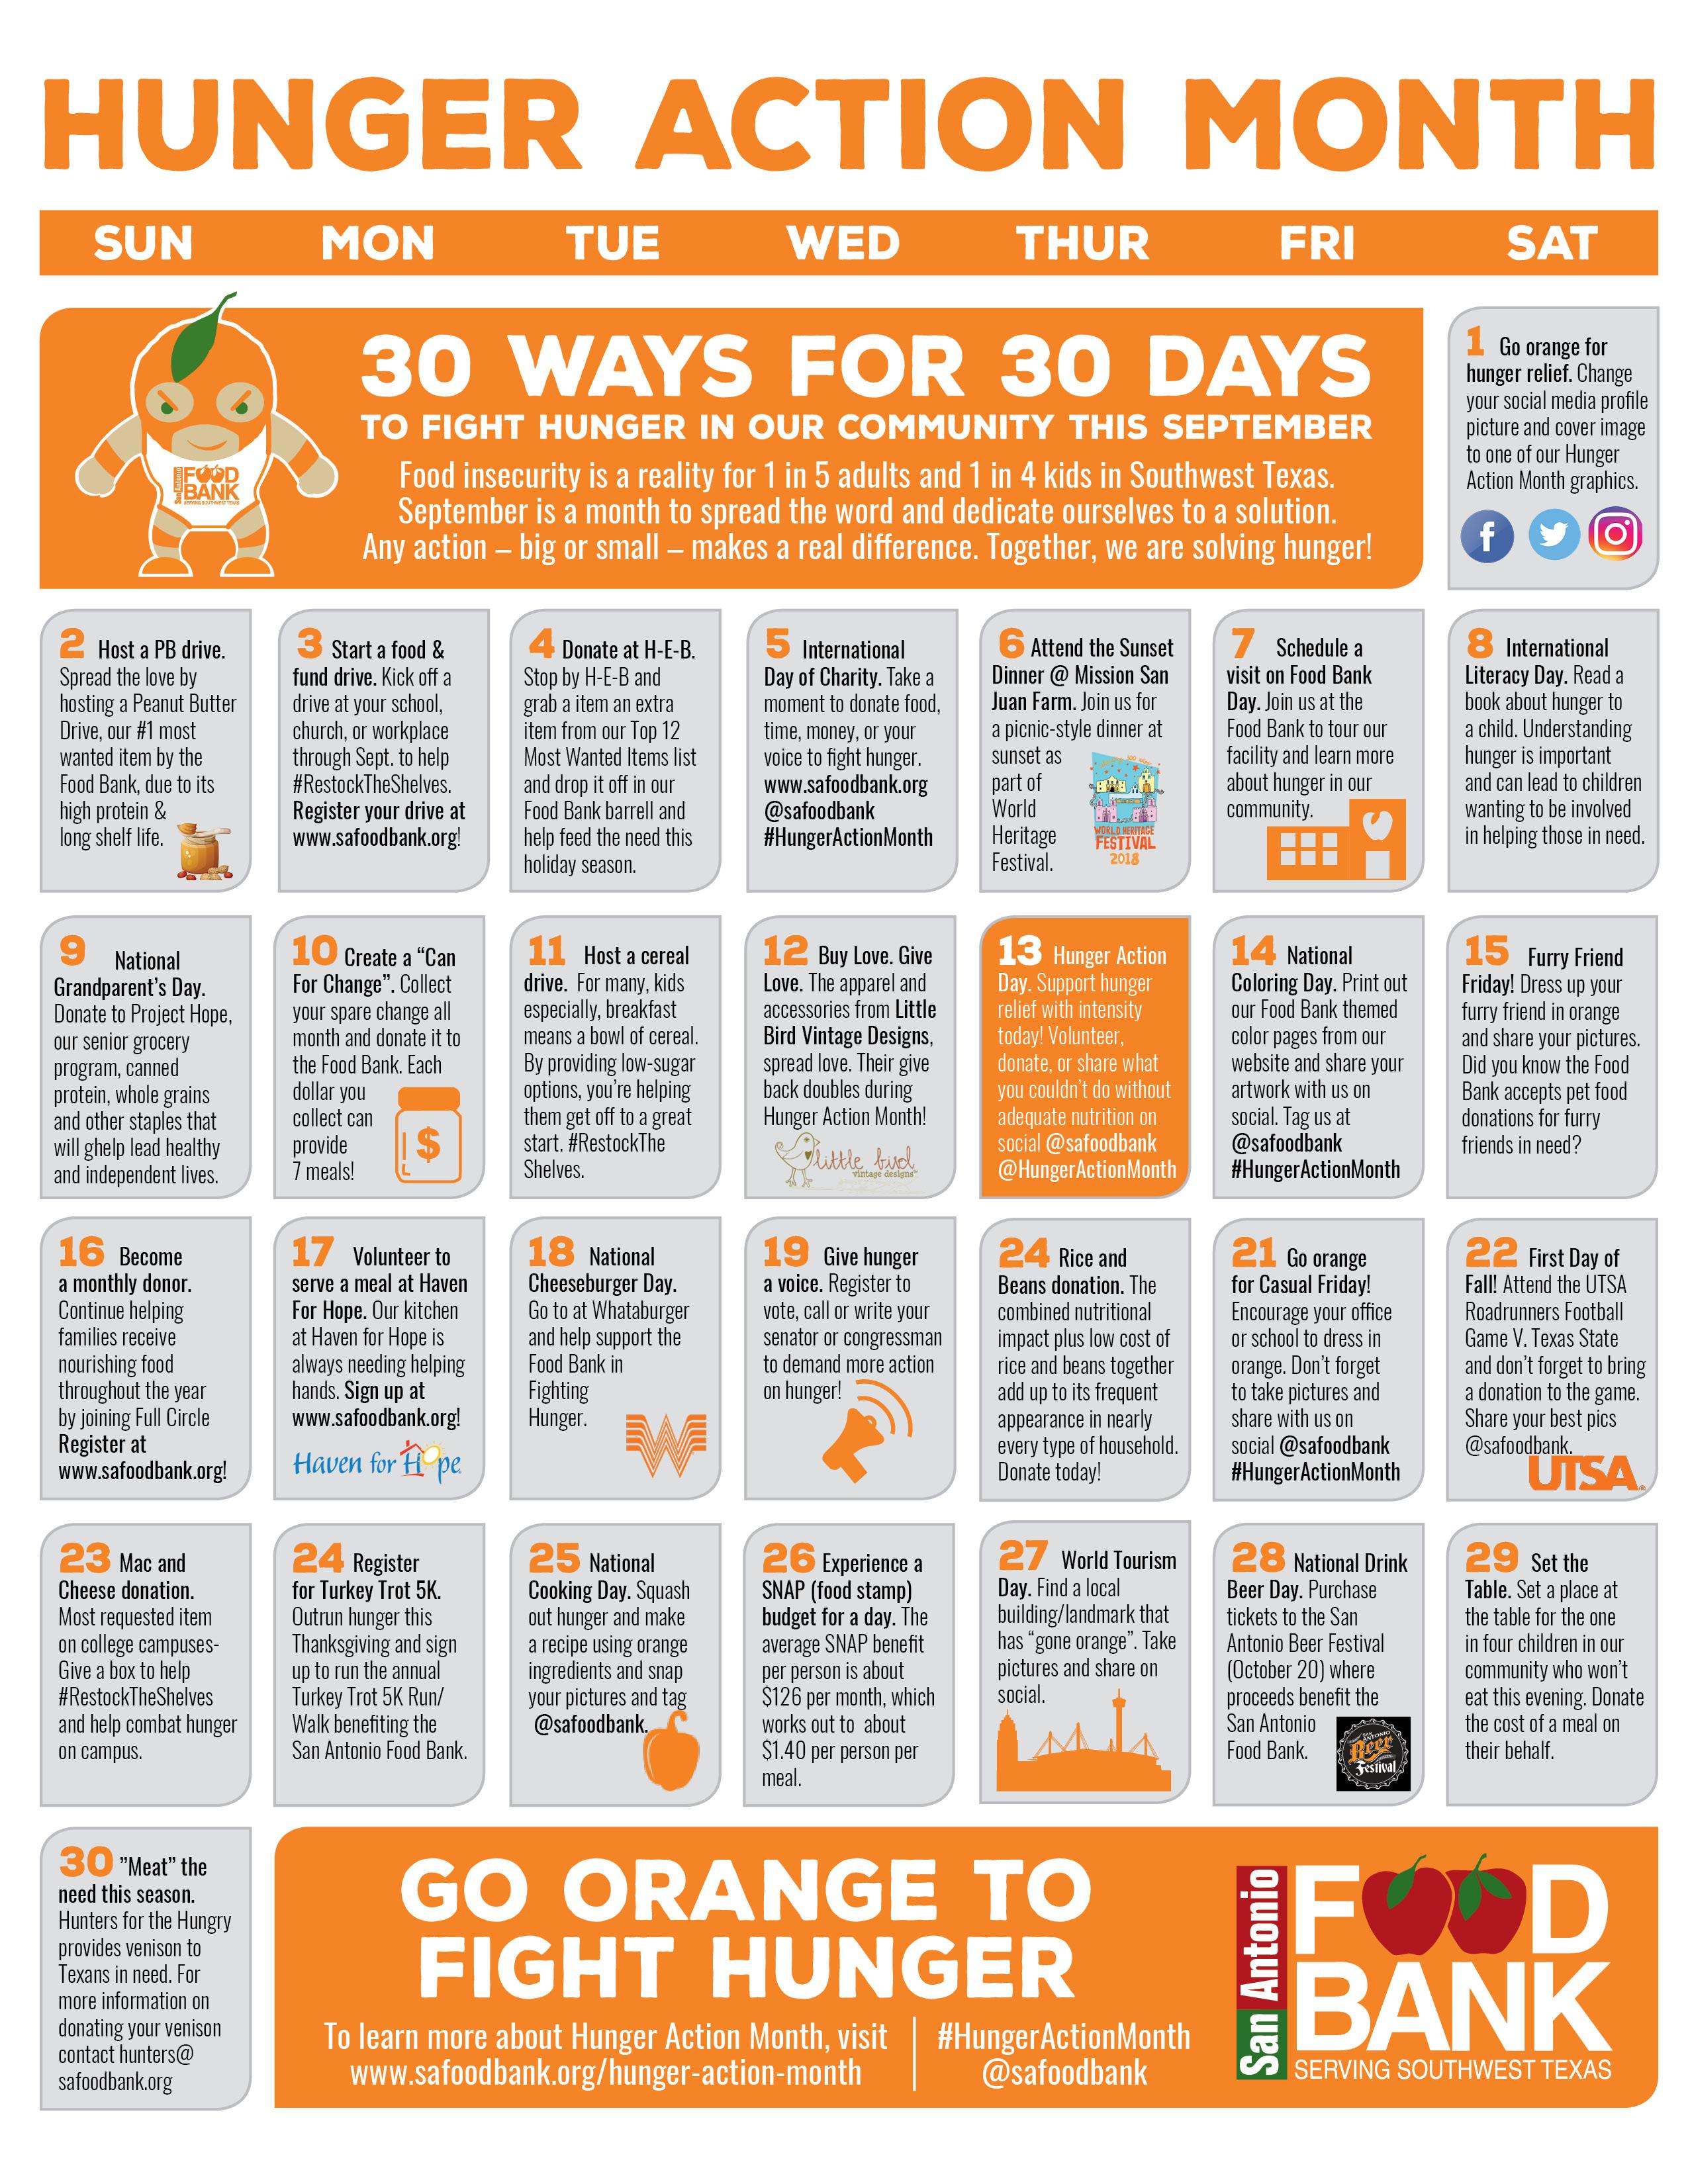 30 Ways For 30 Days Calendar - San Antonio Food Bank